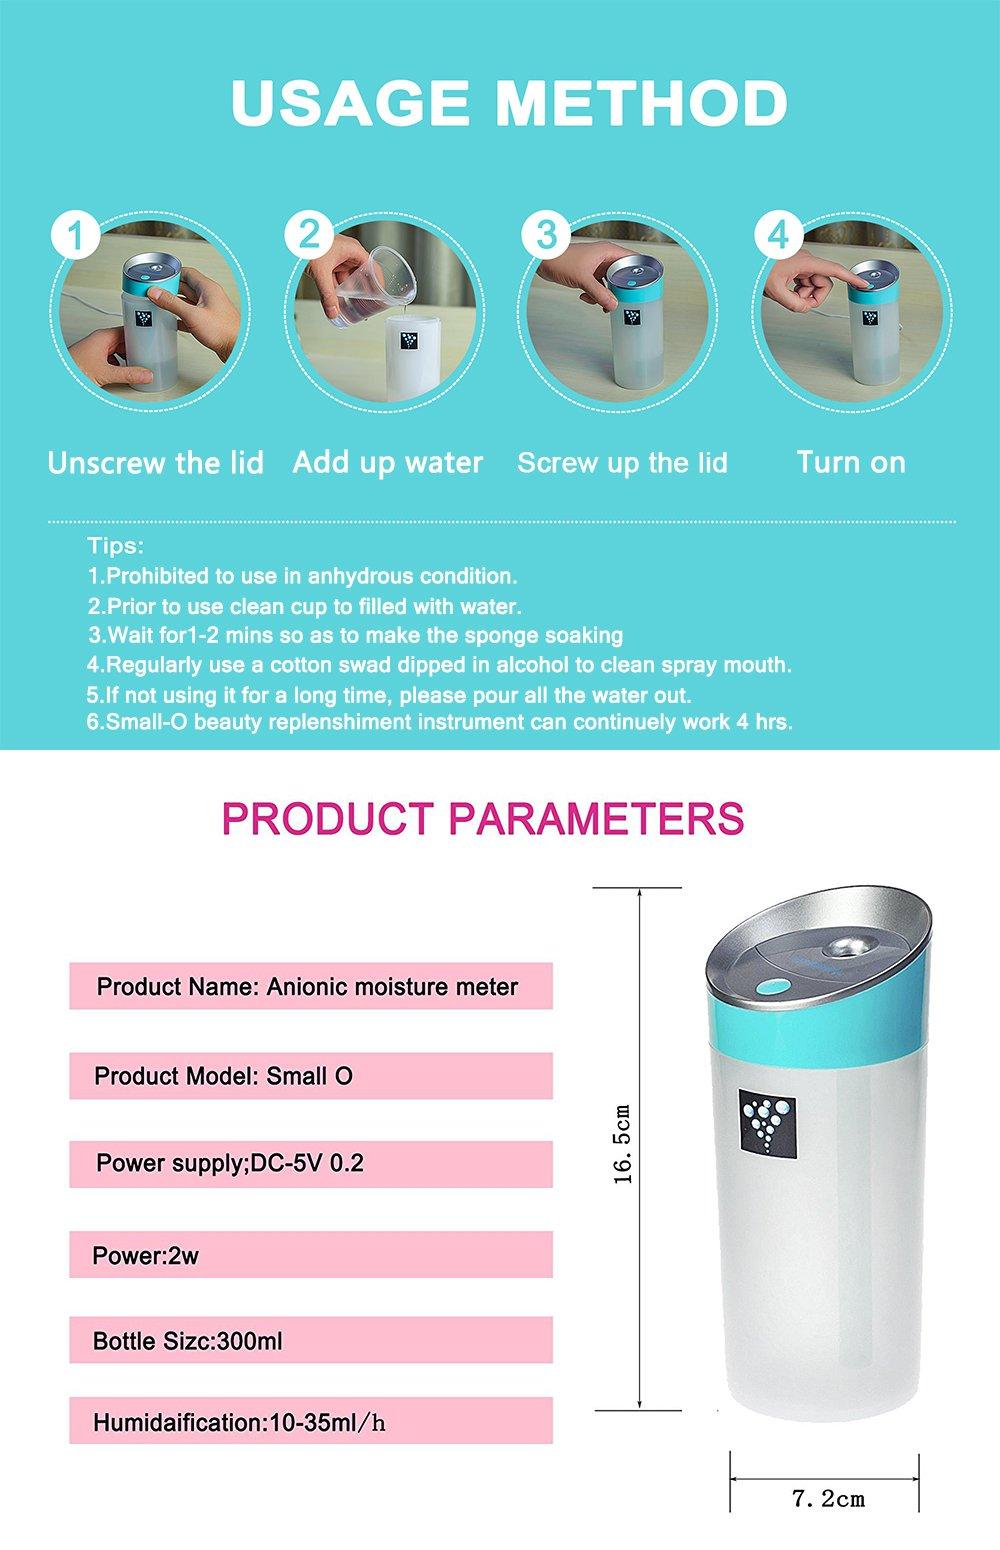 Air Humidifier Ainingshi 300ML USB Mist Ultrasonic Humidifier Mist Maker Portable Adjustable Mist Mode for Office Car Home Study Yoga Spa (Blue) by Ainingshi (Image #6)